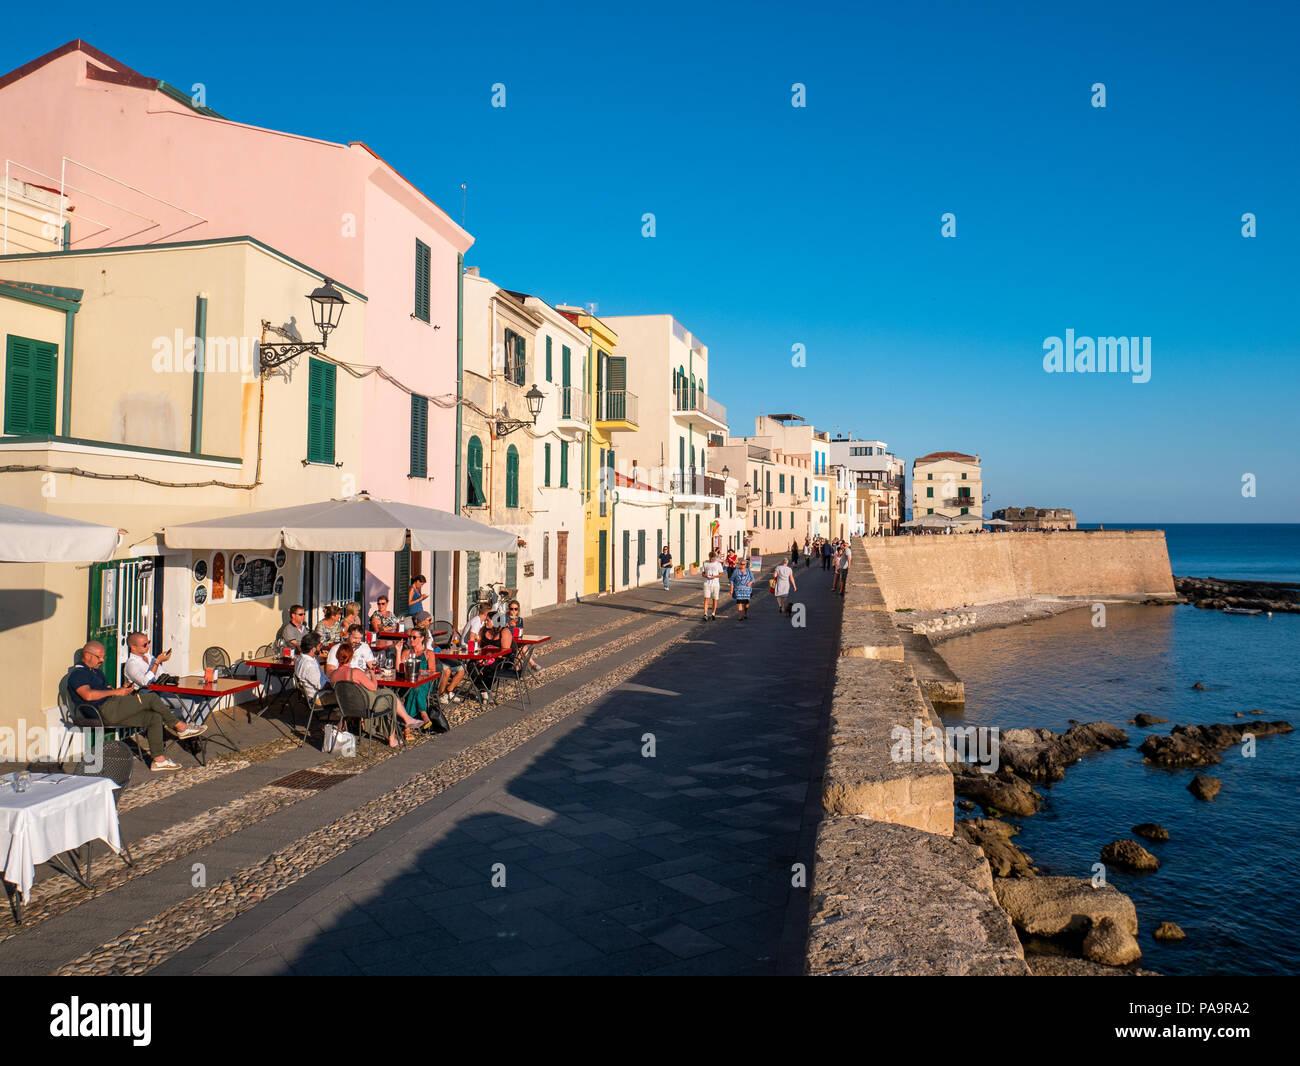 Bar au bord de l'eau sur la promenade, Alghero, Sardaigne, Italie Photo Stock